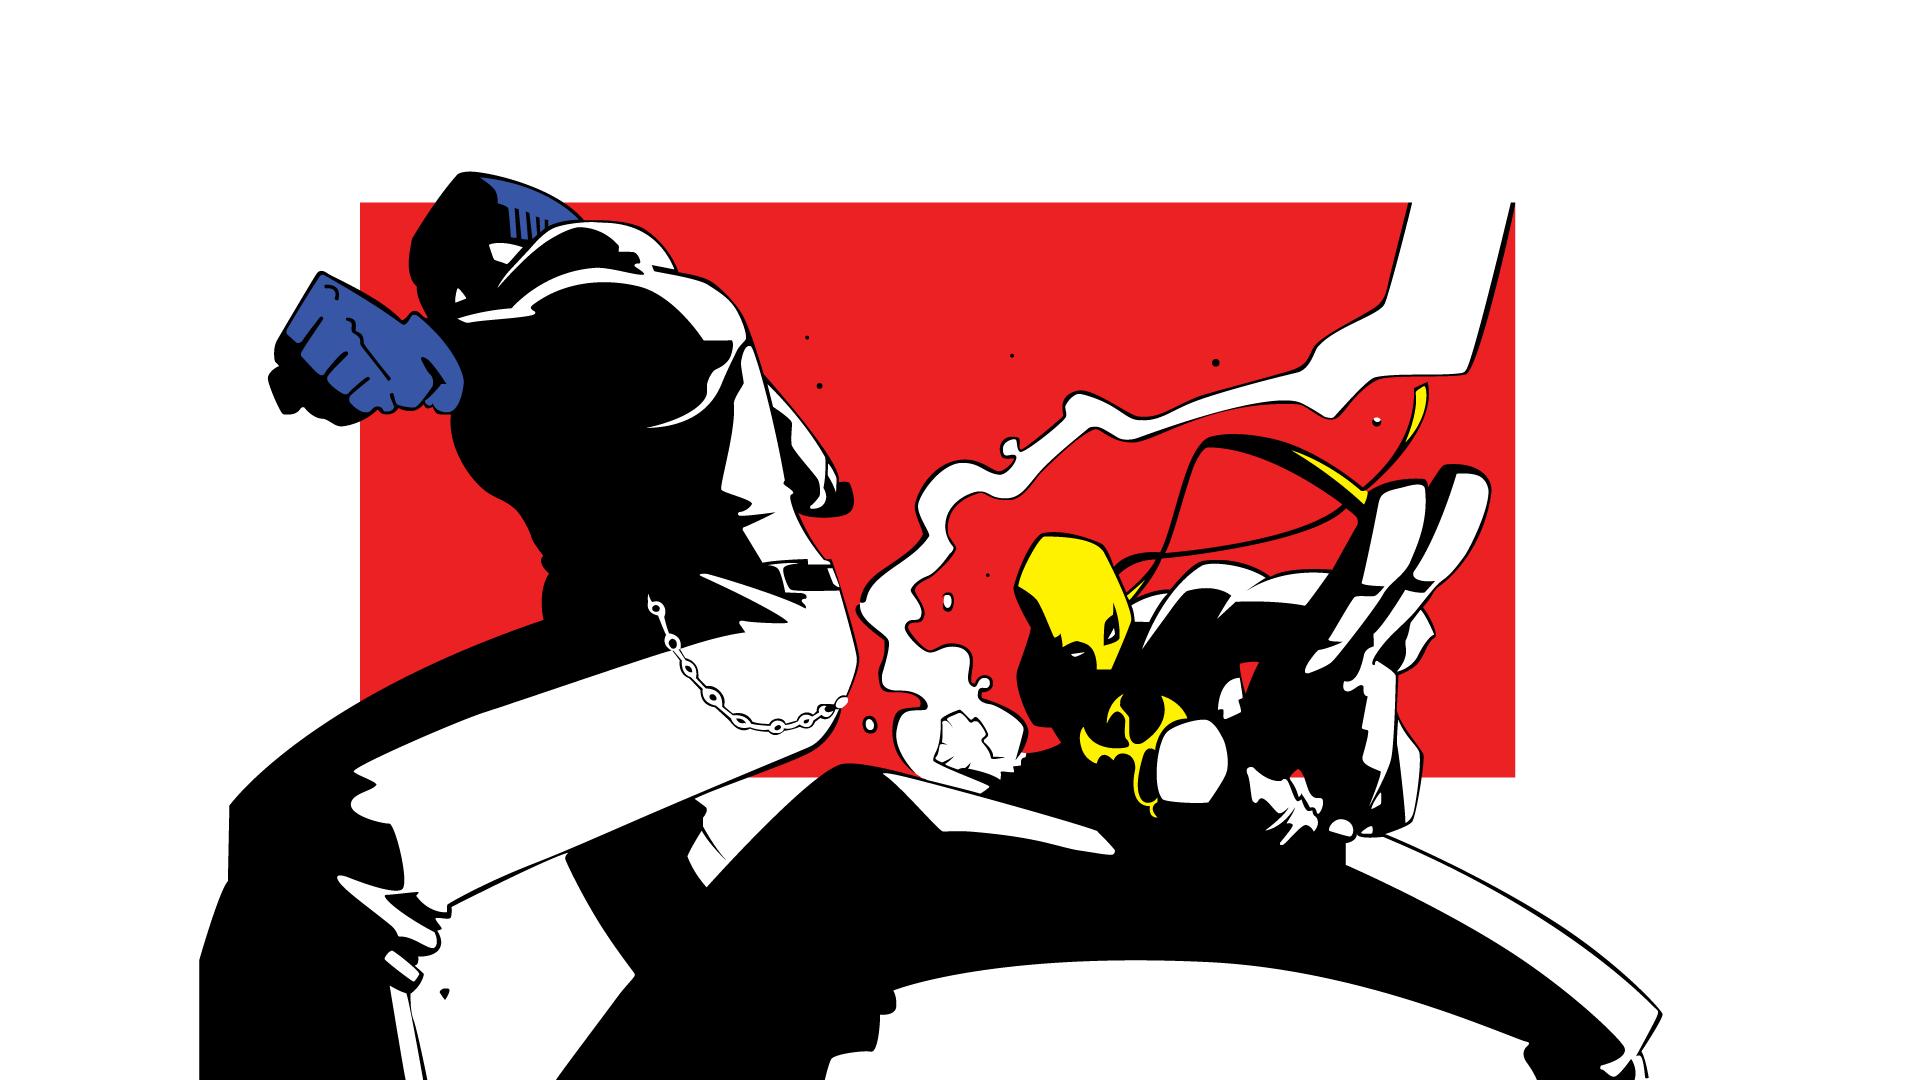 1920x1080 Power Man And Iron Fist Wallpaper [1920x1080] Marvel